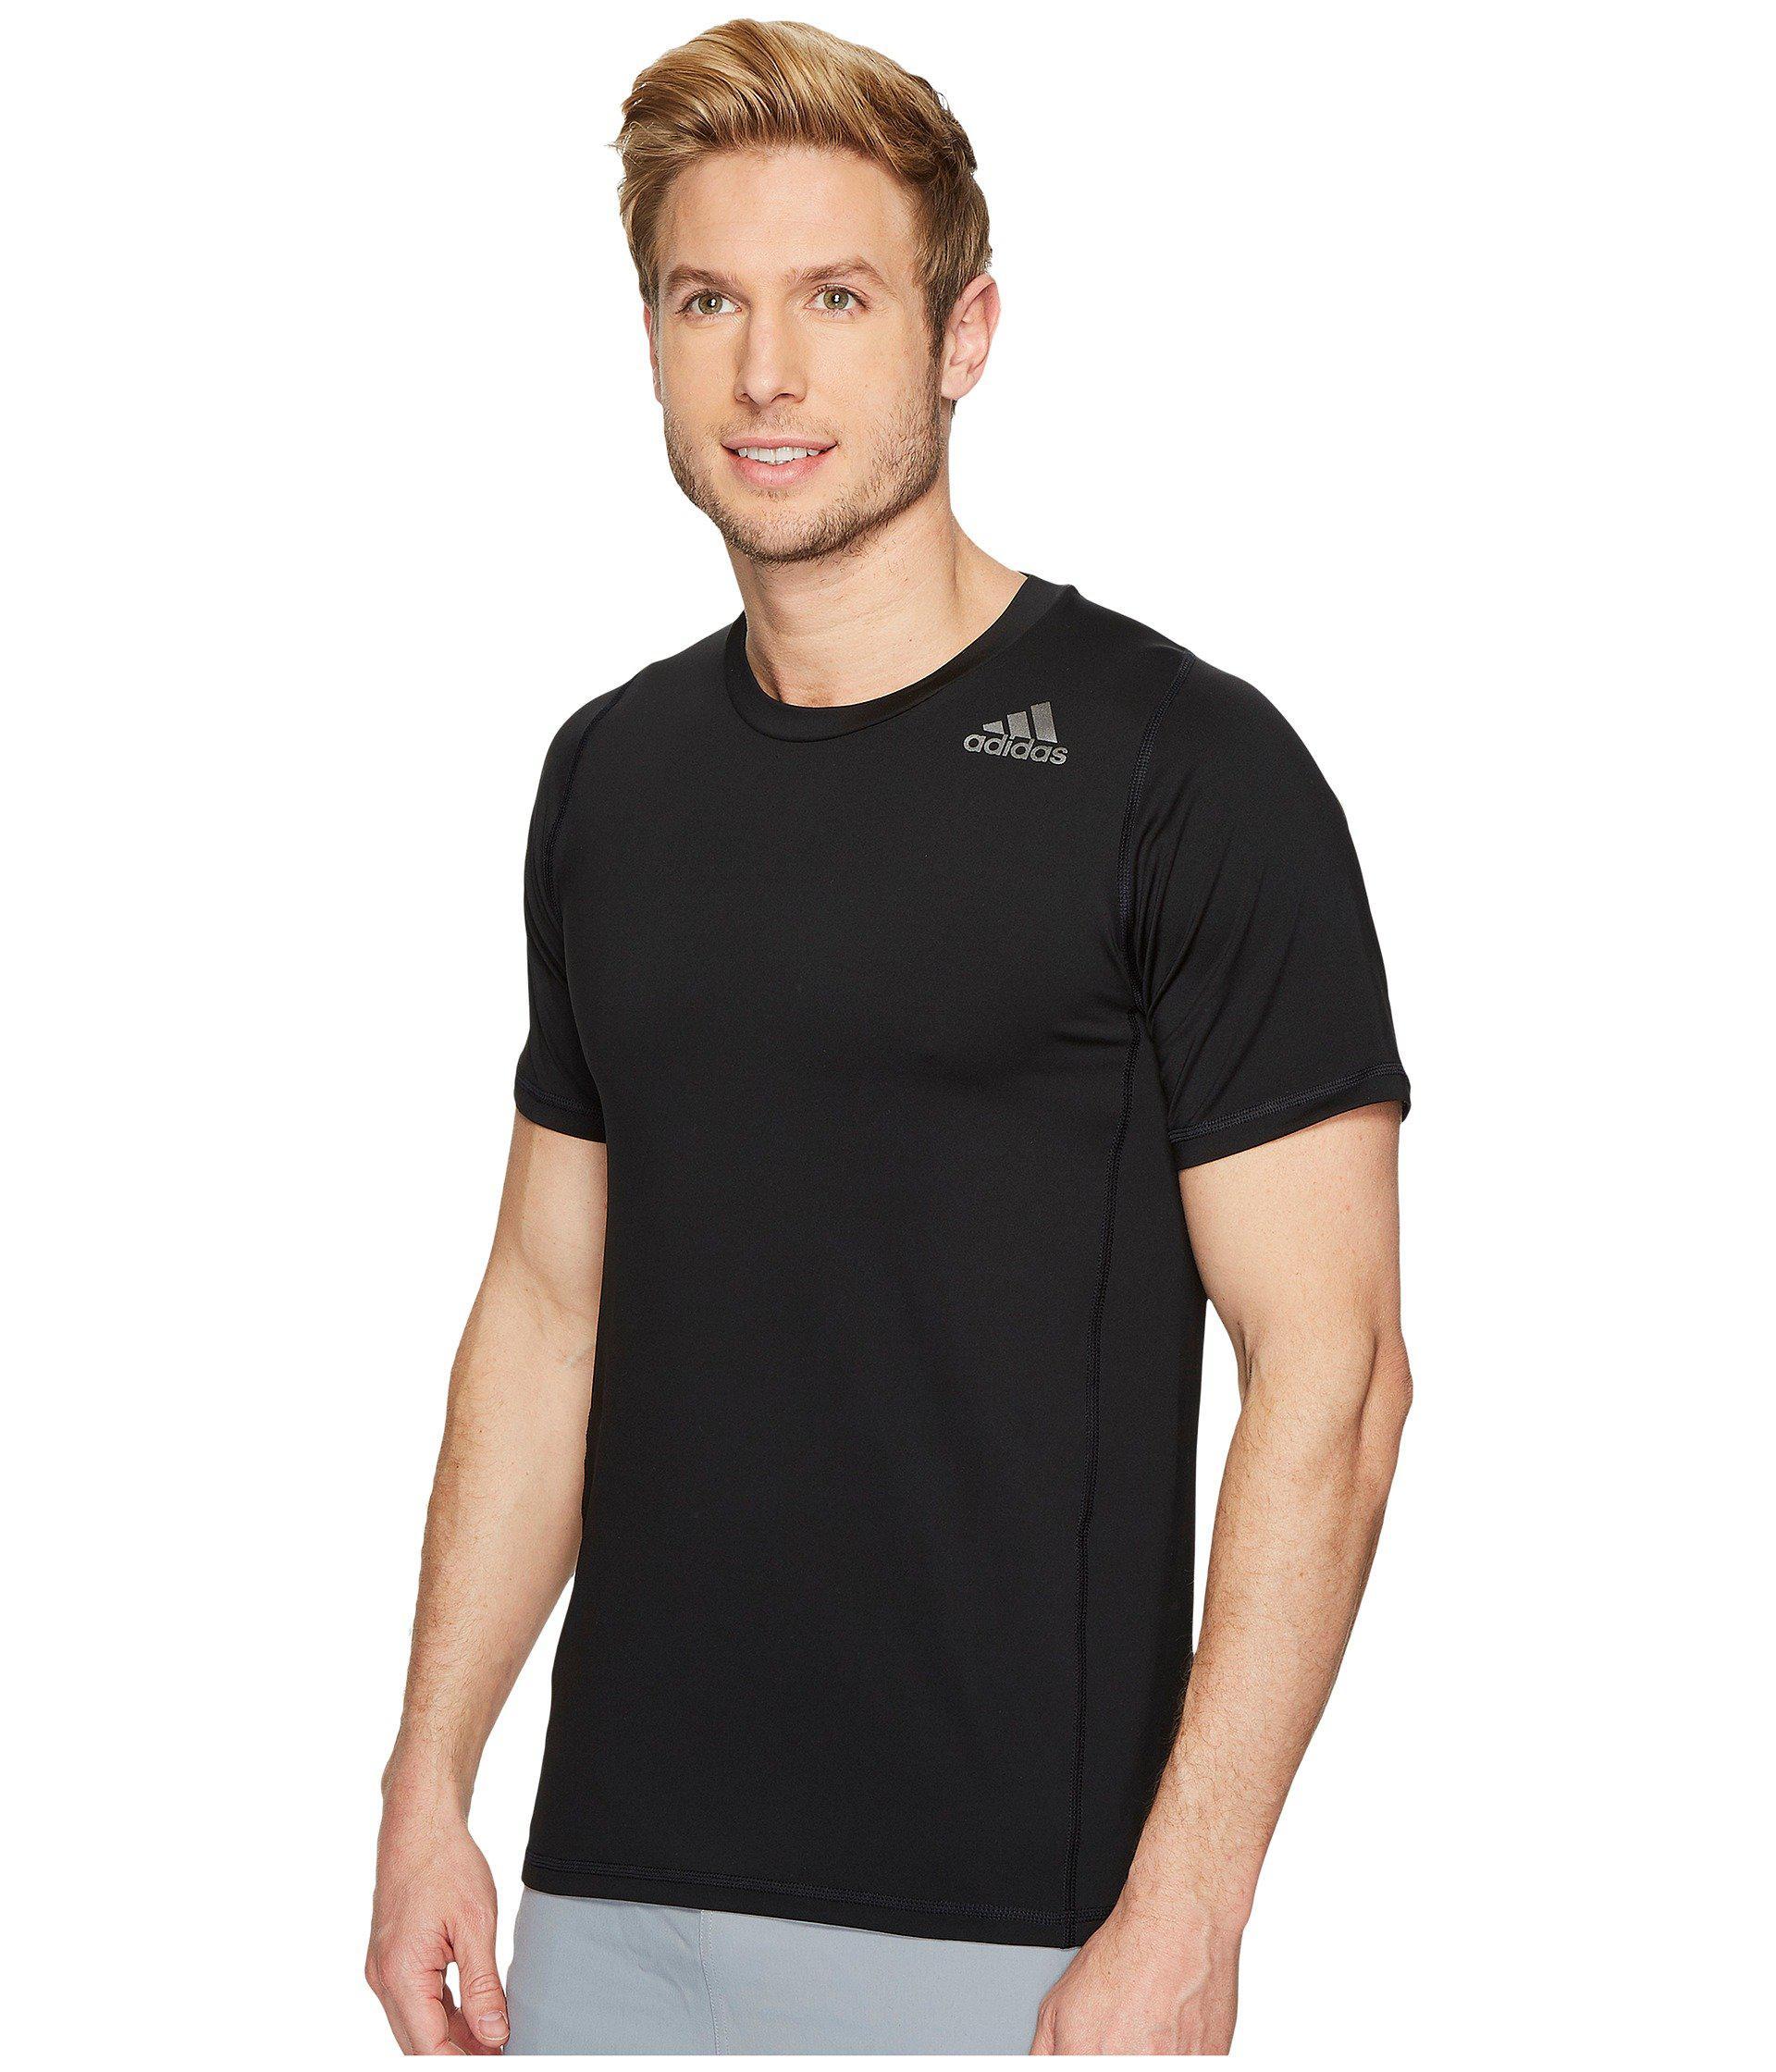 cab8c99d6 Adidas - Black Alphaskin Sport Fitted Short Sleeve Tee for Men - Lyst. View  fullscreen